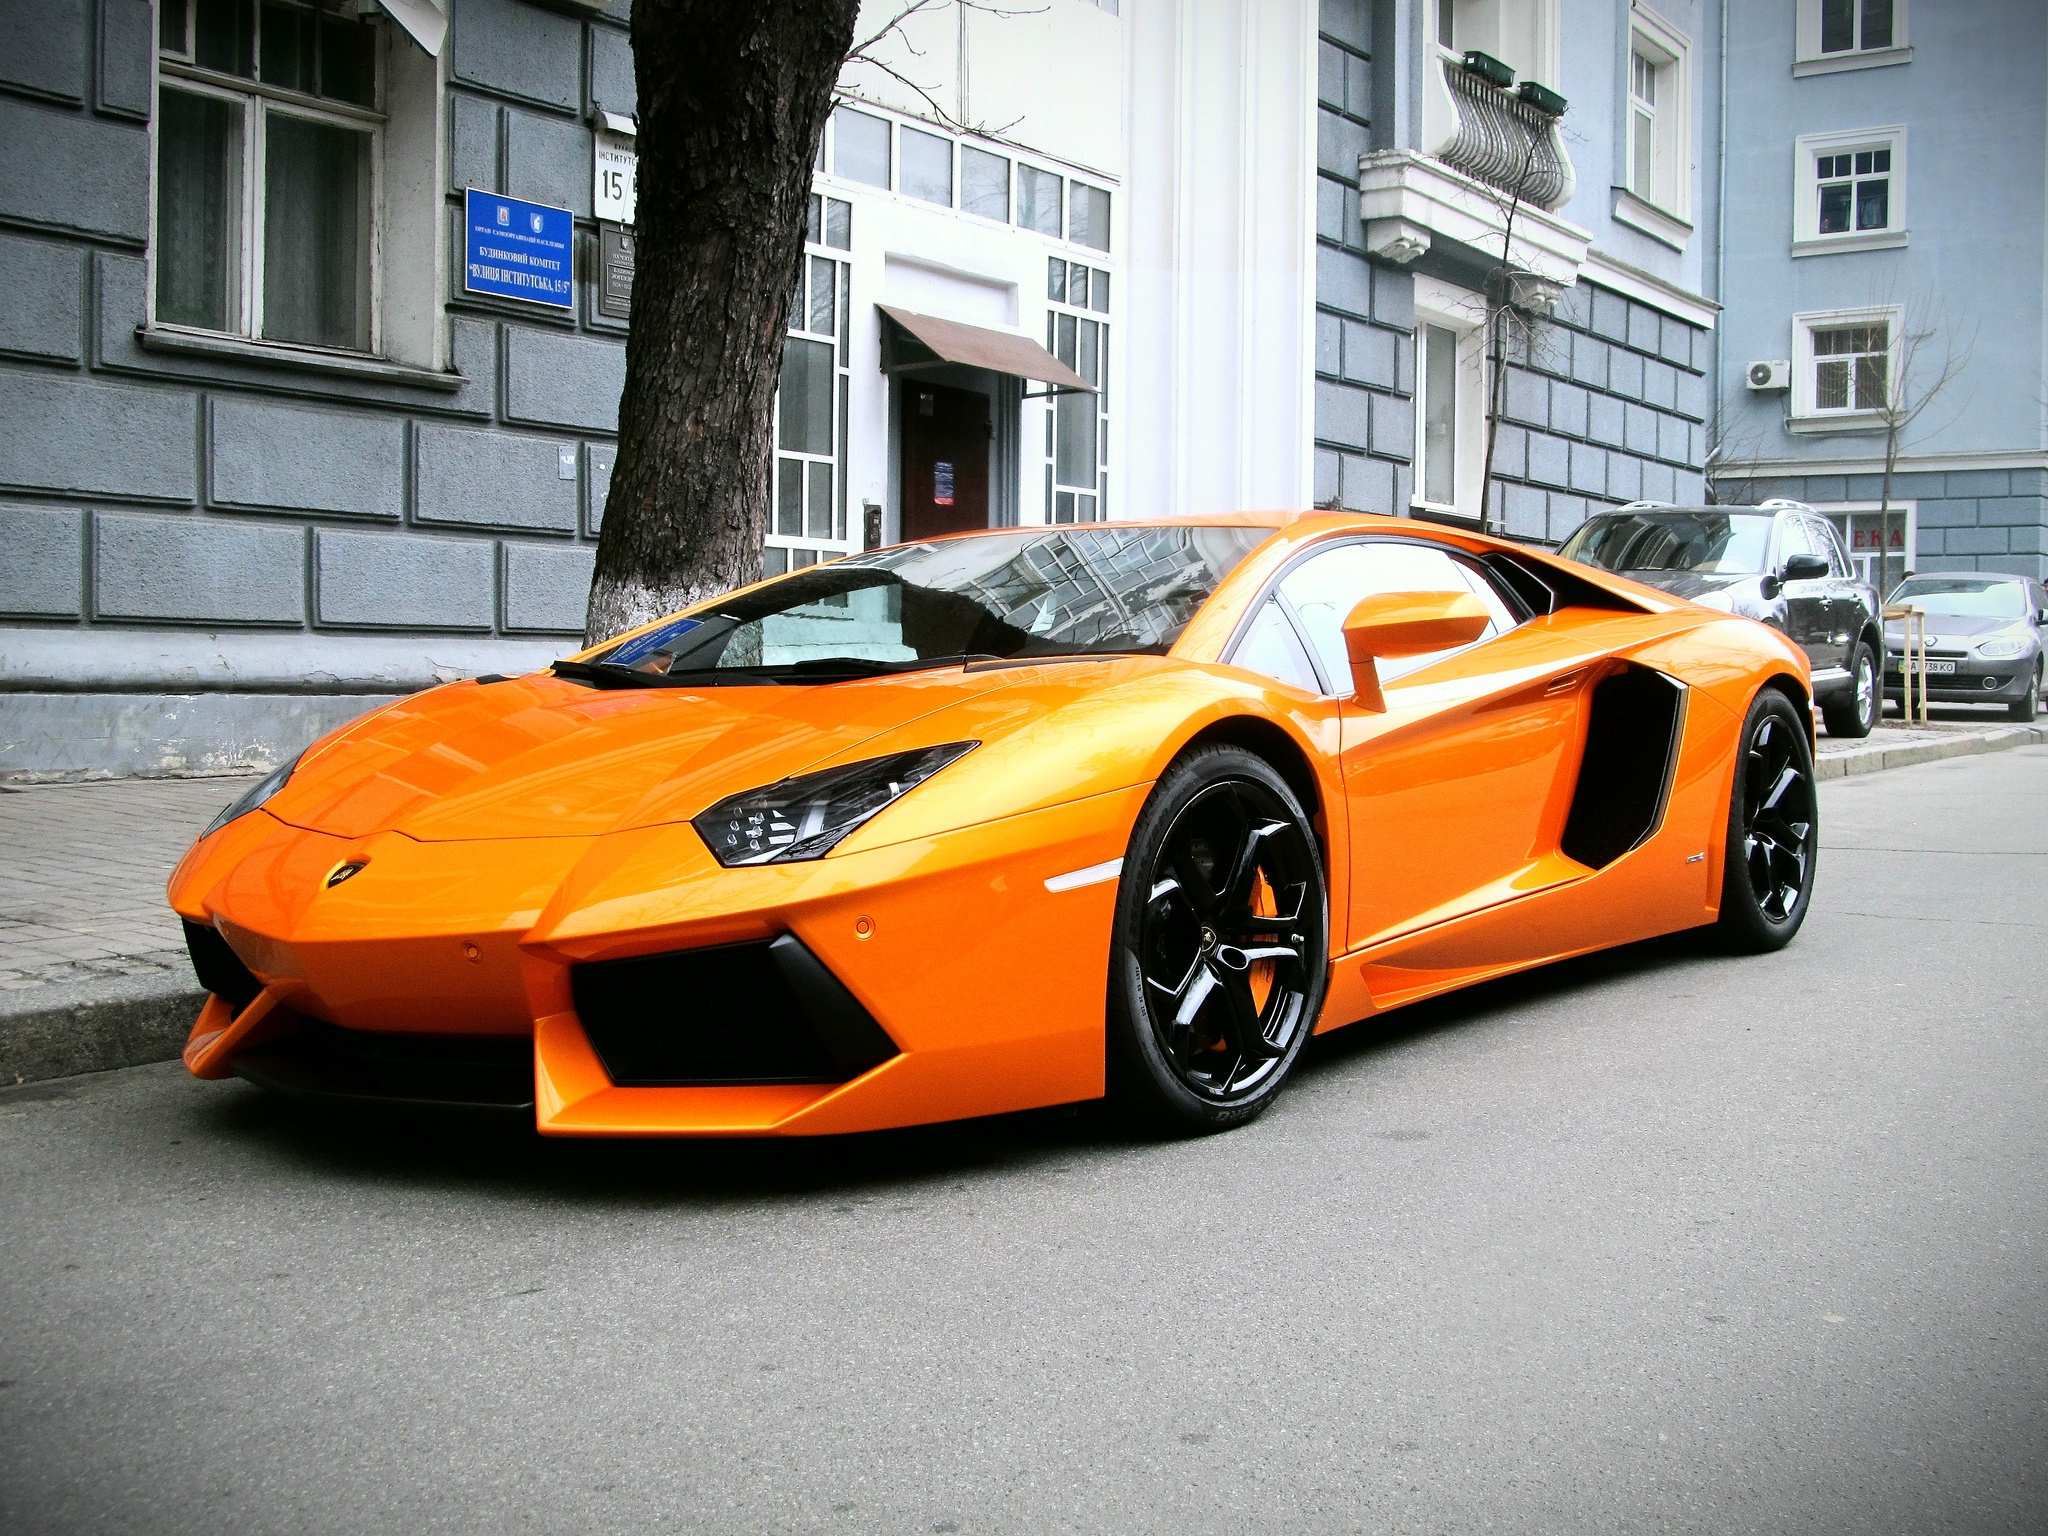 119887 download wallpaper Lamborghini, Cars, Aventador, Lp700-4 screensavers and pictures for free